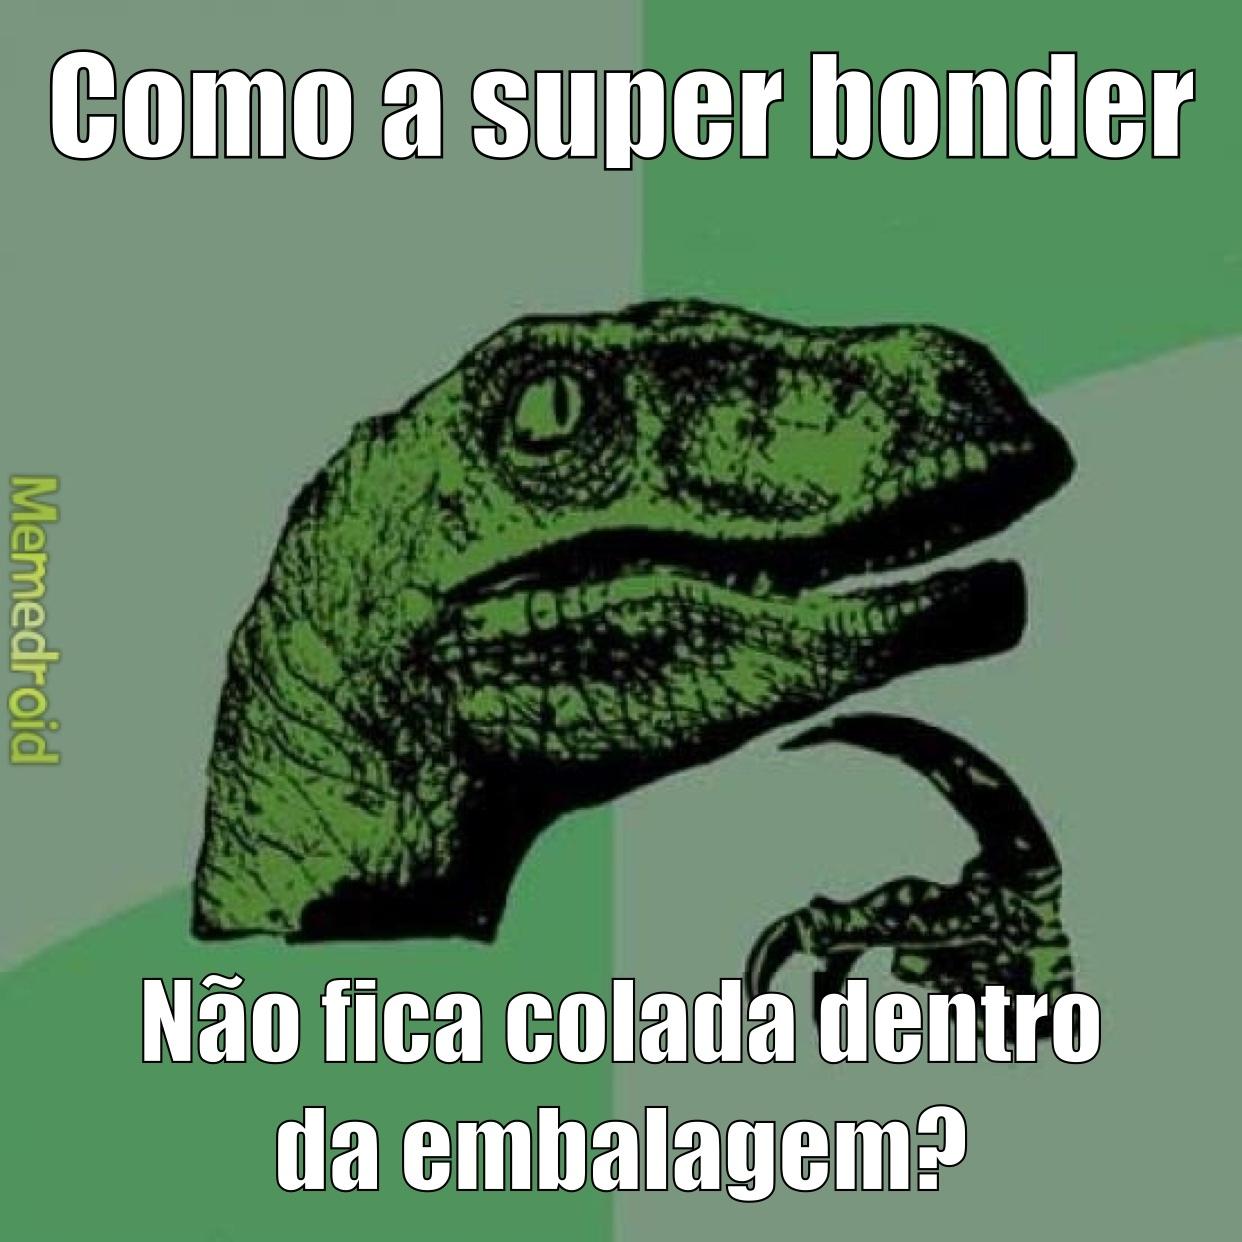 Philosoraptor Super Bonder - meme